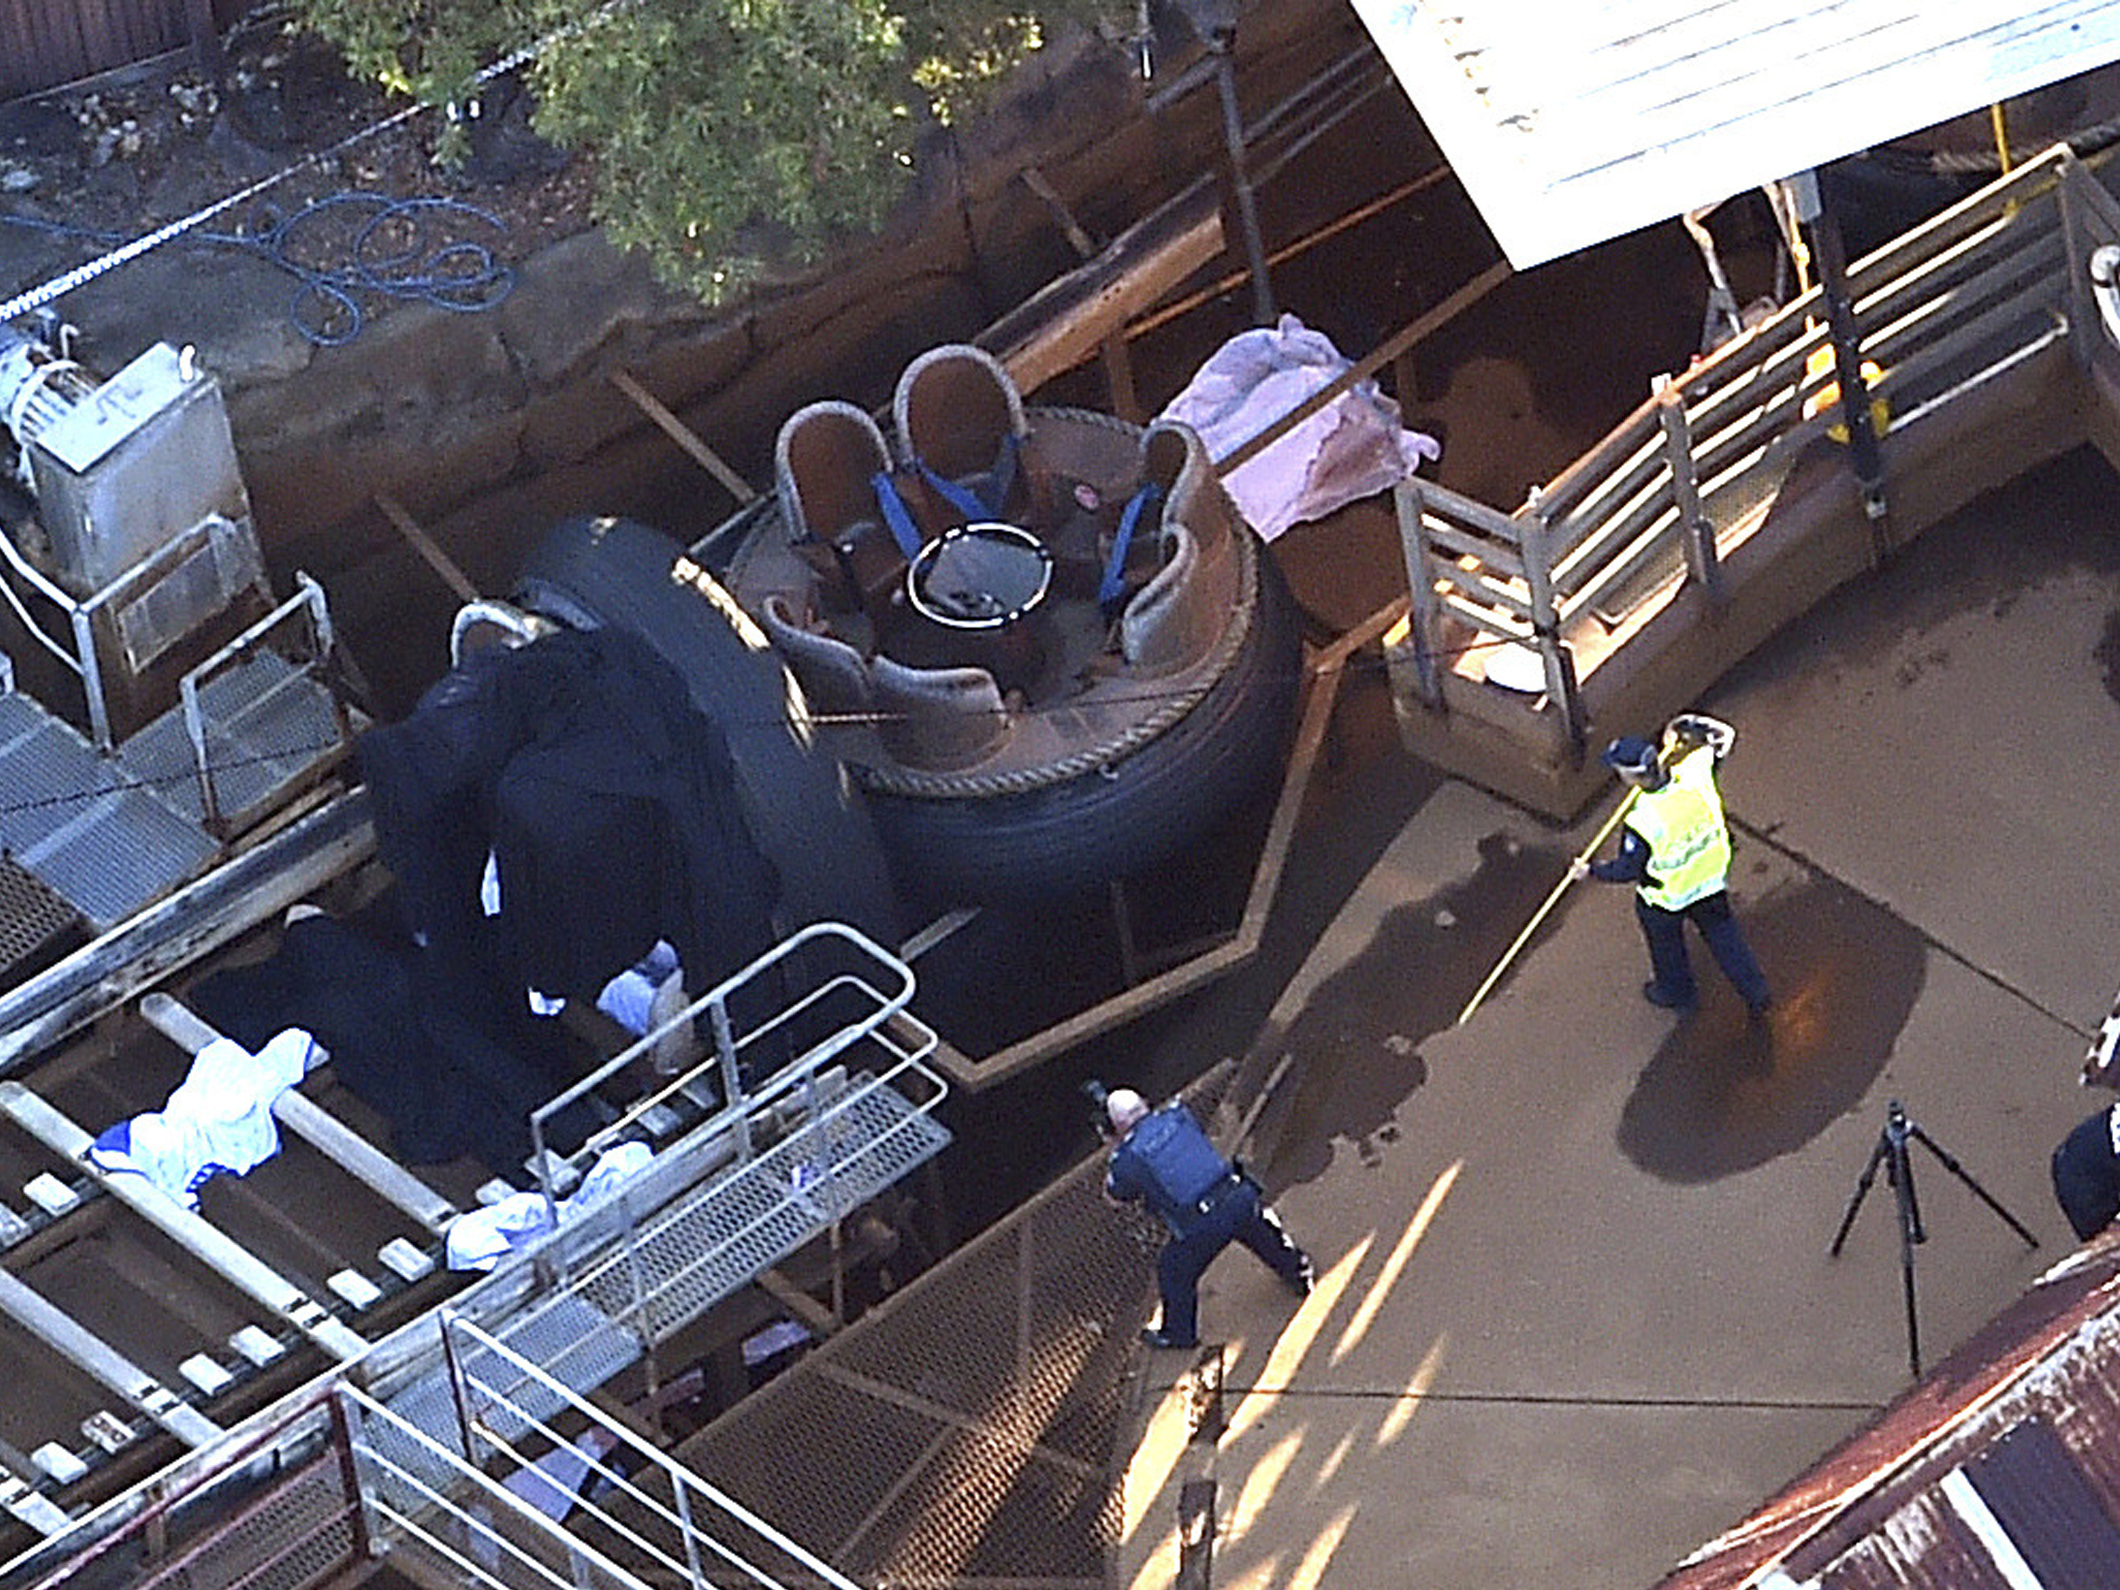 Four killed on river rapids ride at Australian theme park